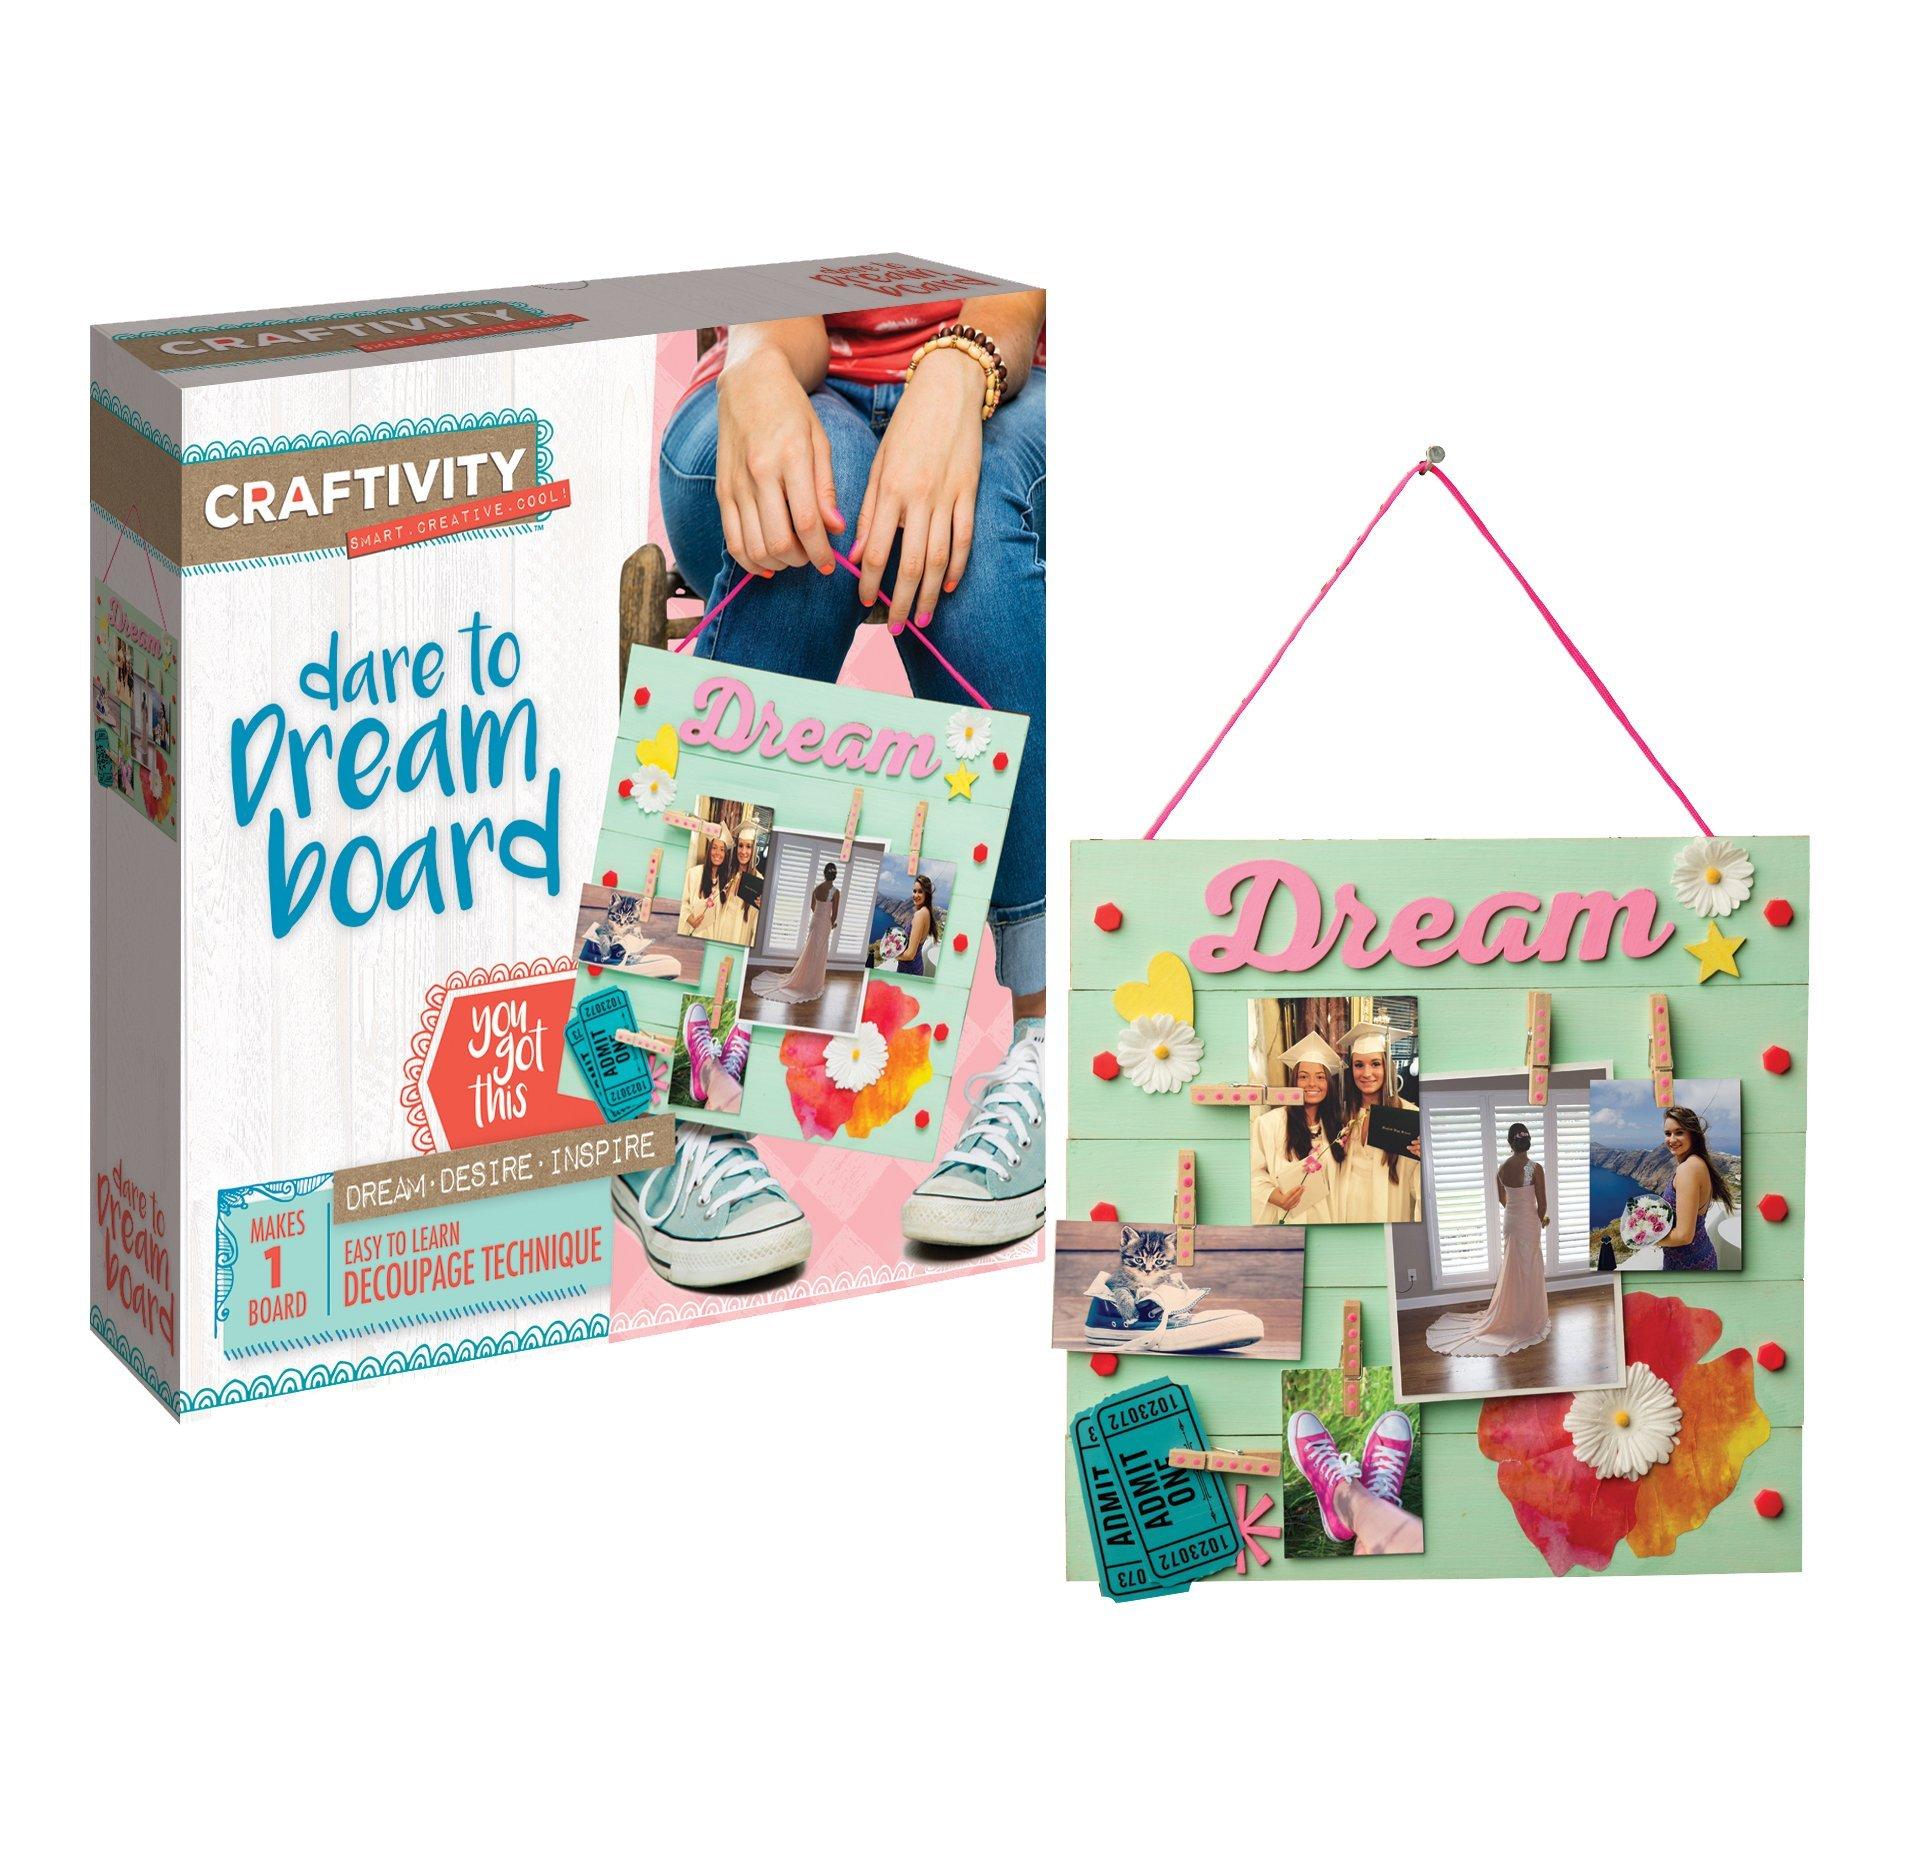 CRAFTIVITY Dare to Dream Board Craft Kit